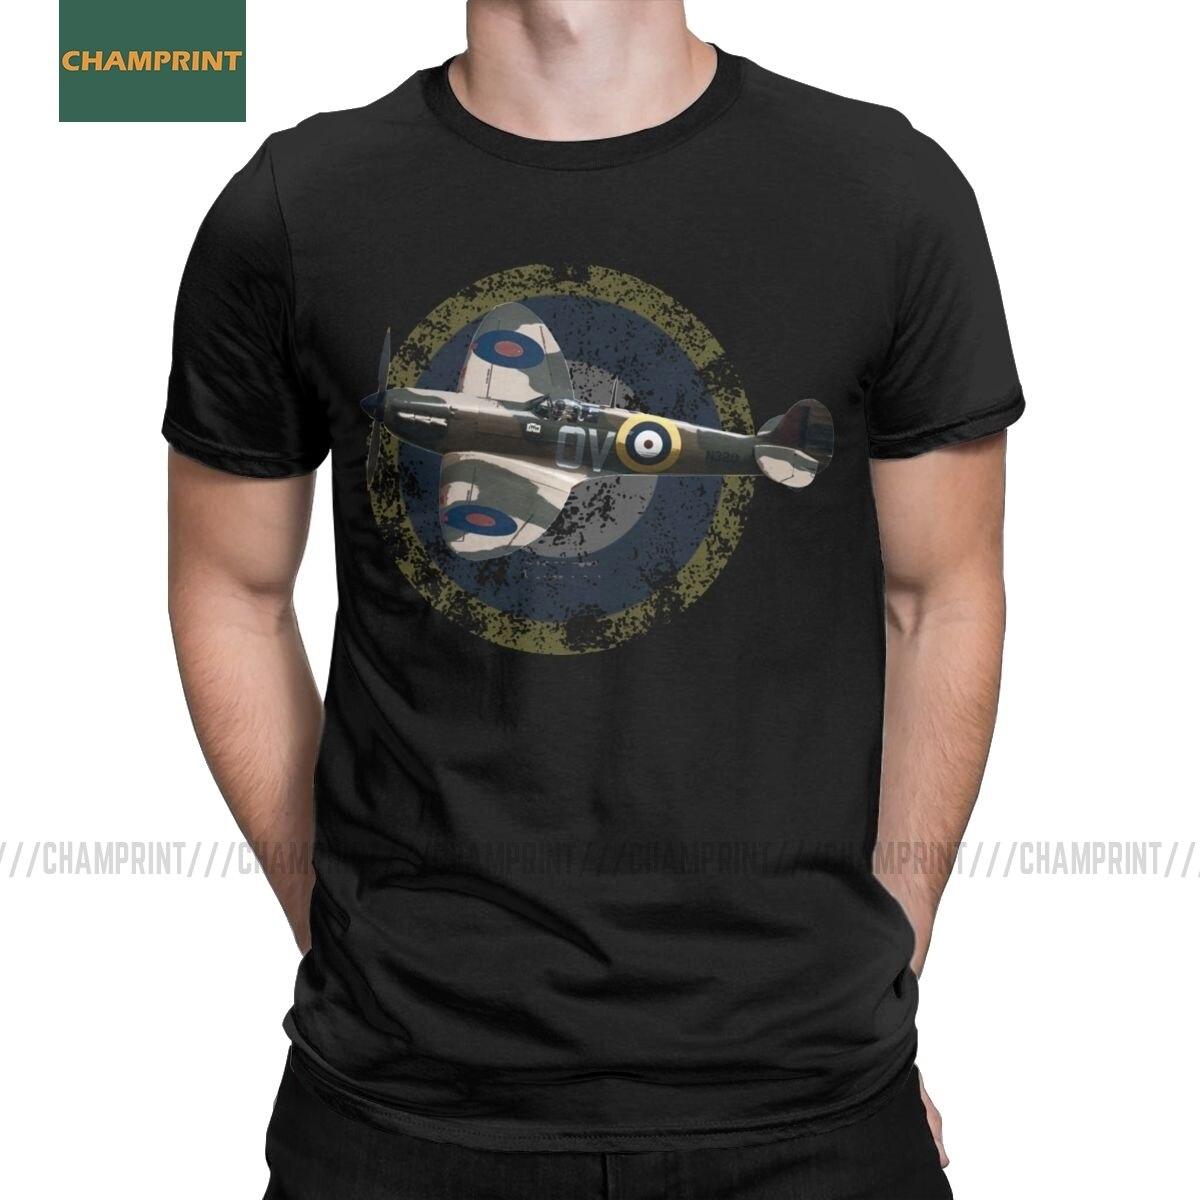 British RAF Supermarine Spitfire Fighter Plane T Shirts Men Cotton T-Shirts Plane WW2 Pilot Aircraft Airplane Tees Short Sleeve